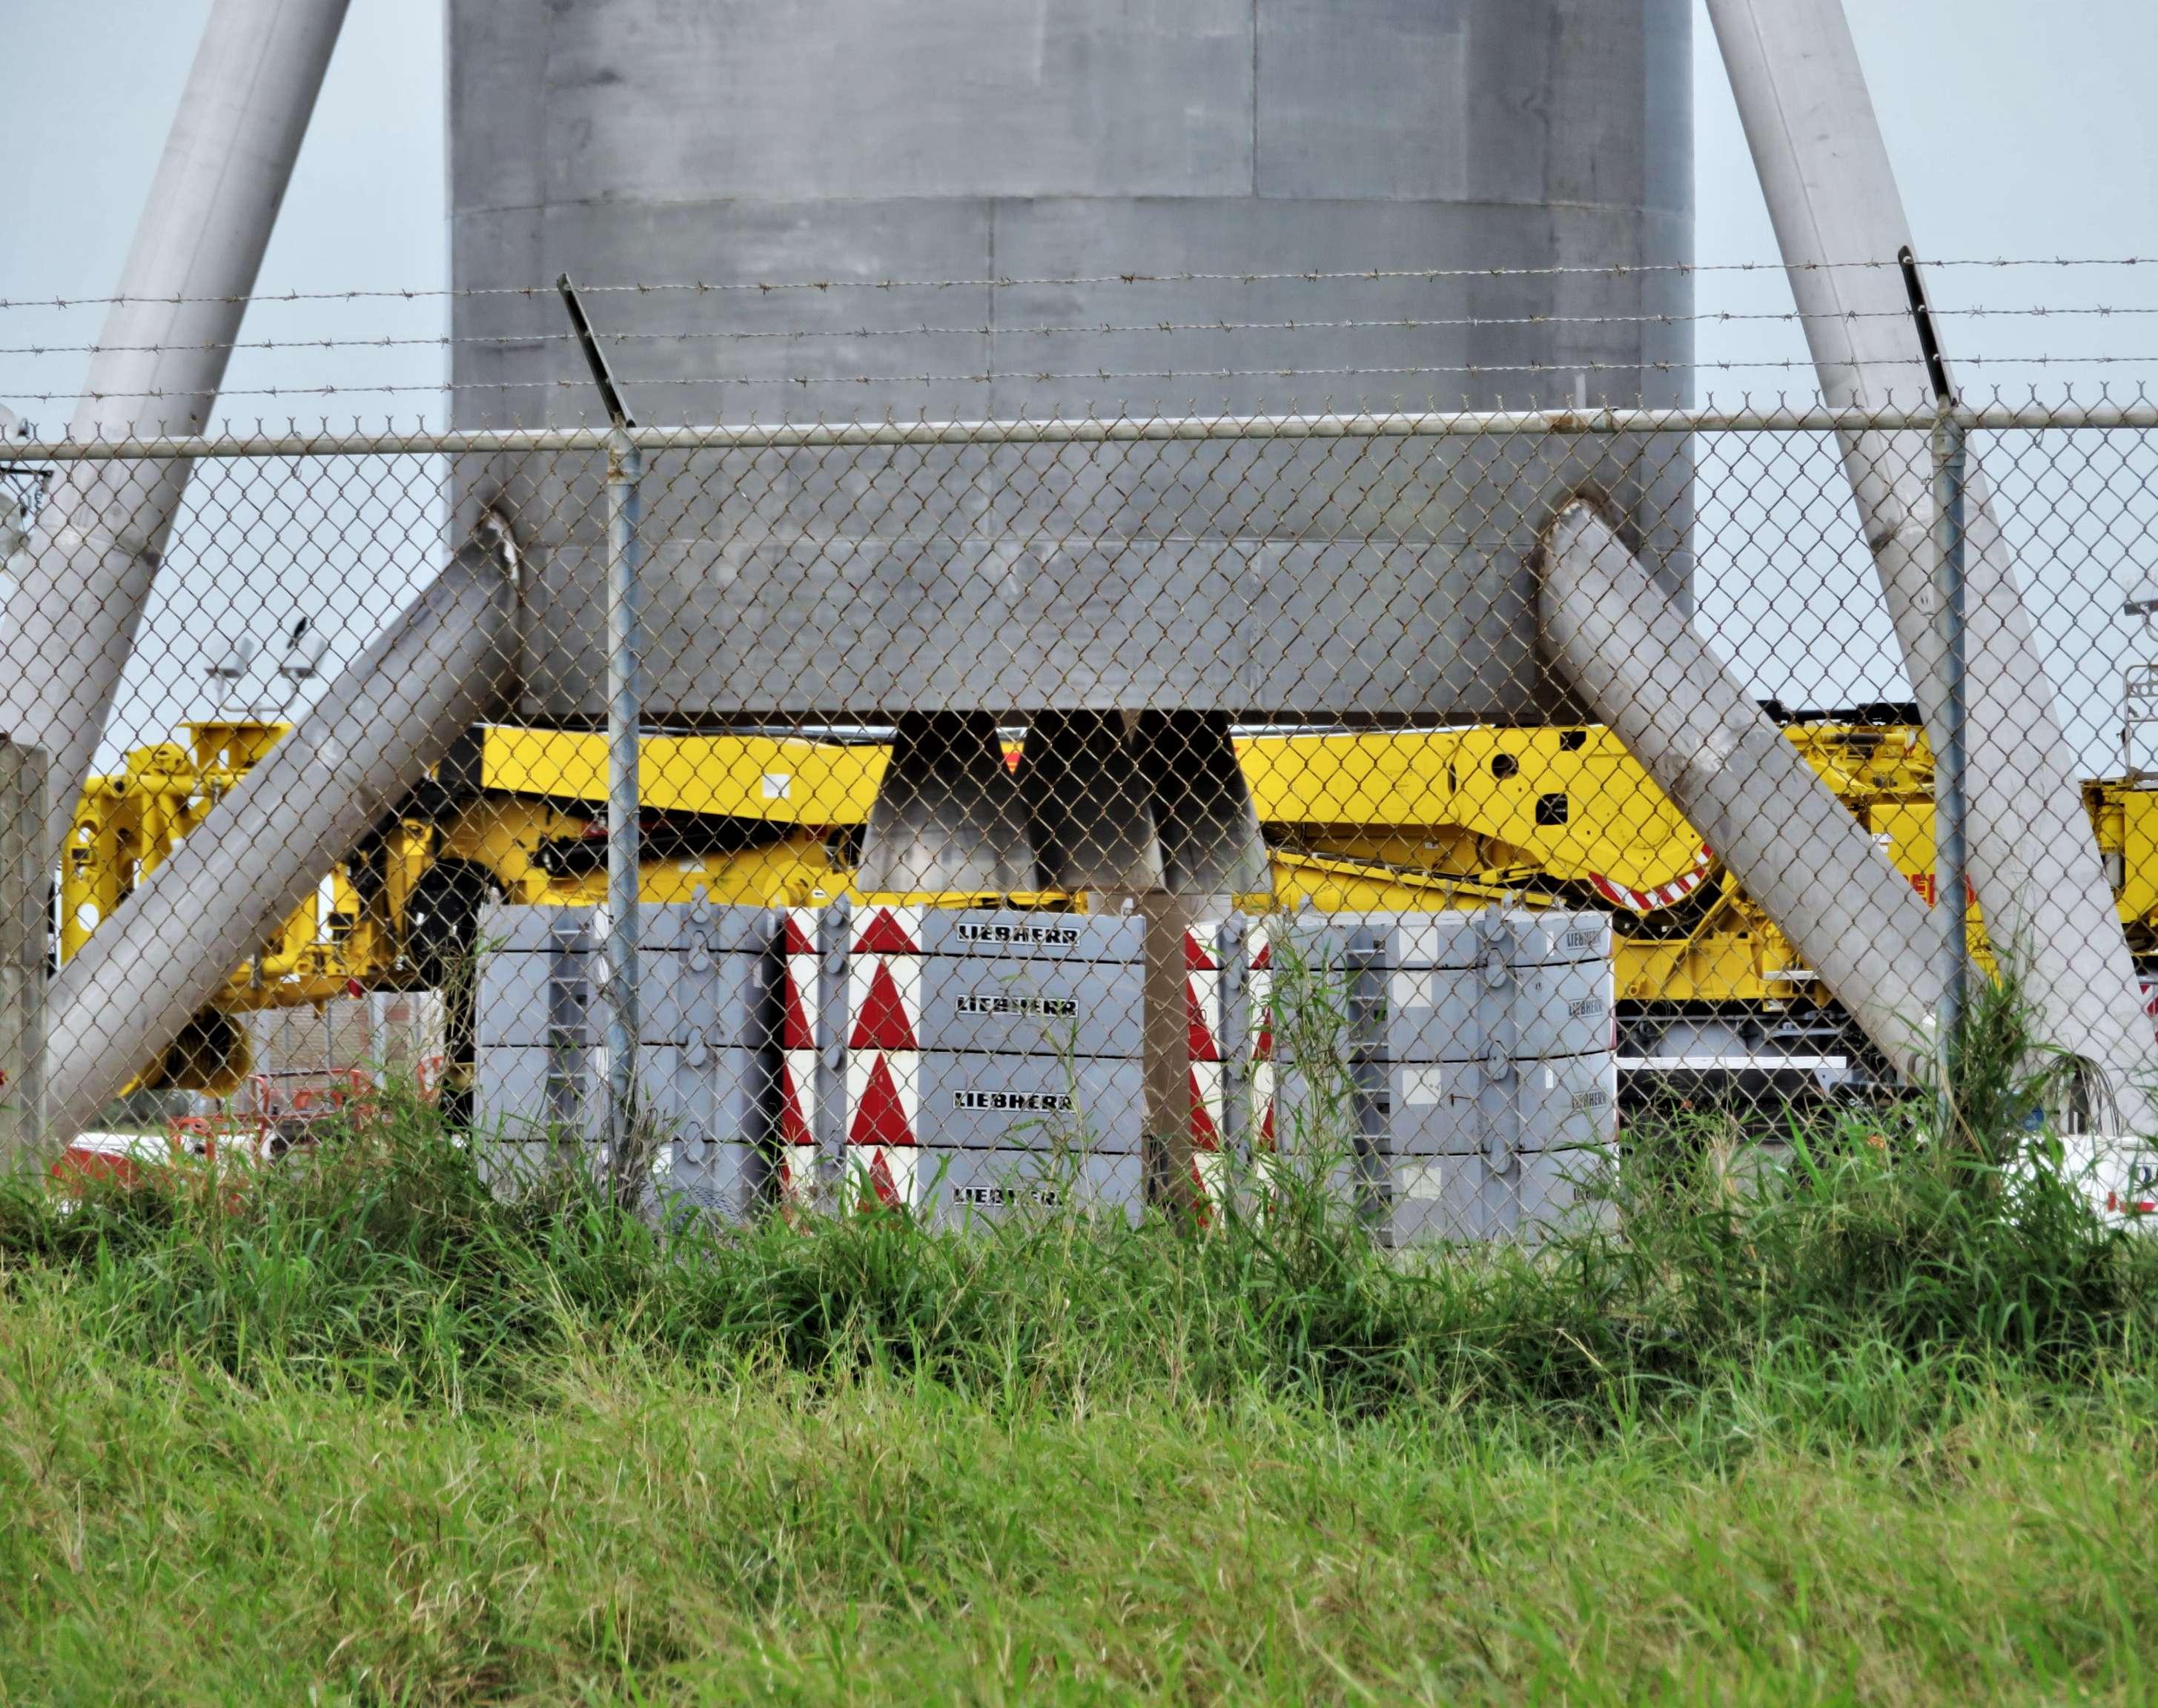 Boca Chica Starship Alpha progress 010118 (NSF – bocachicagal) 3(c)